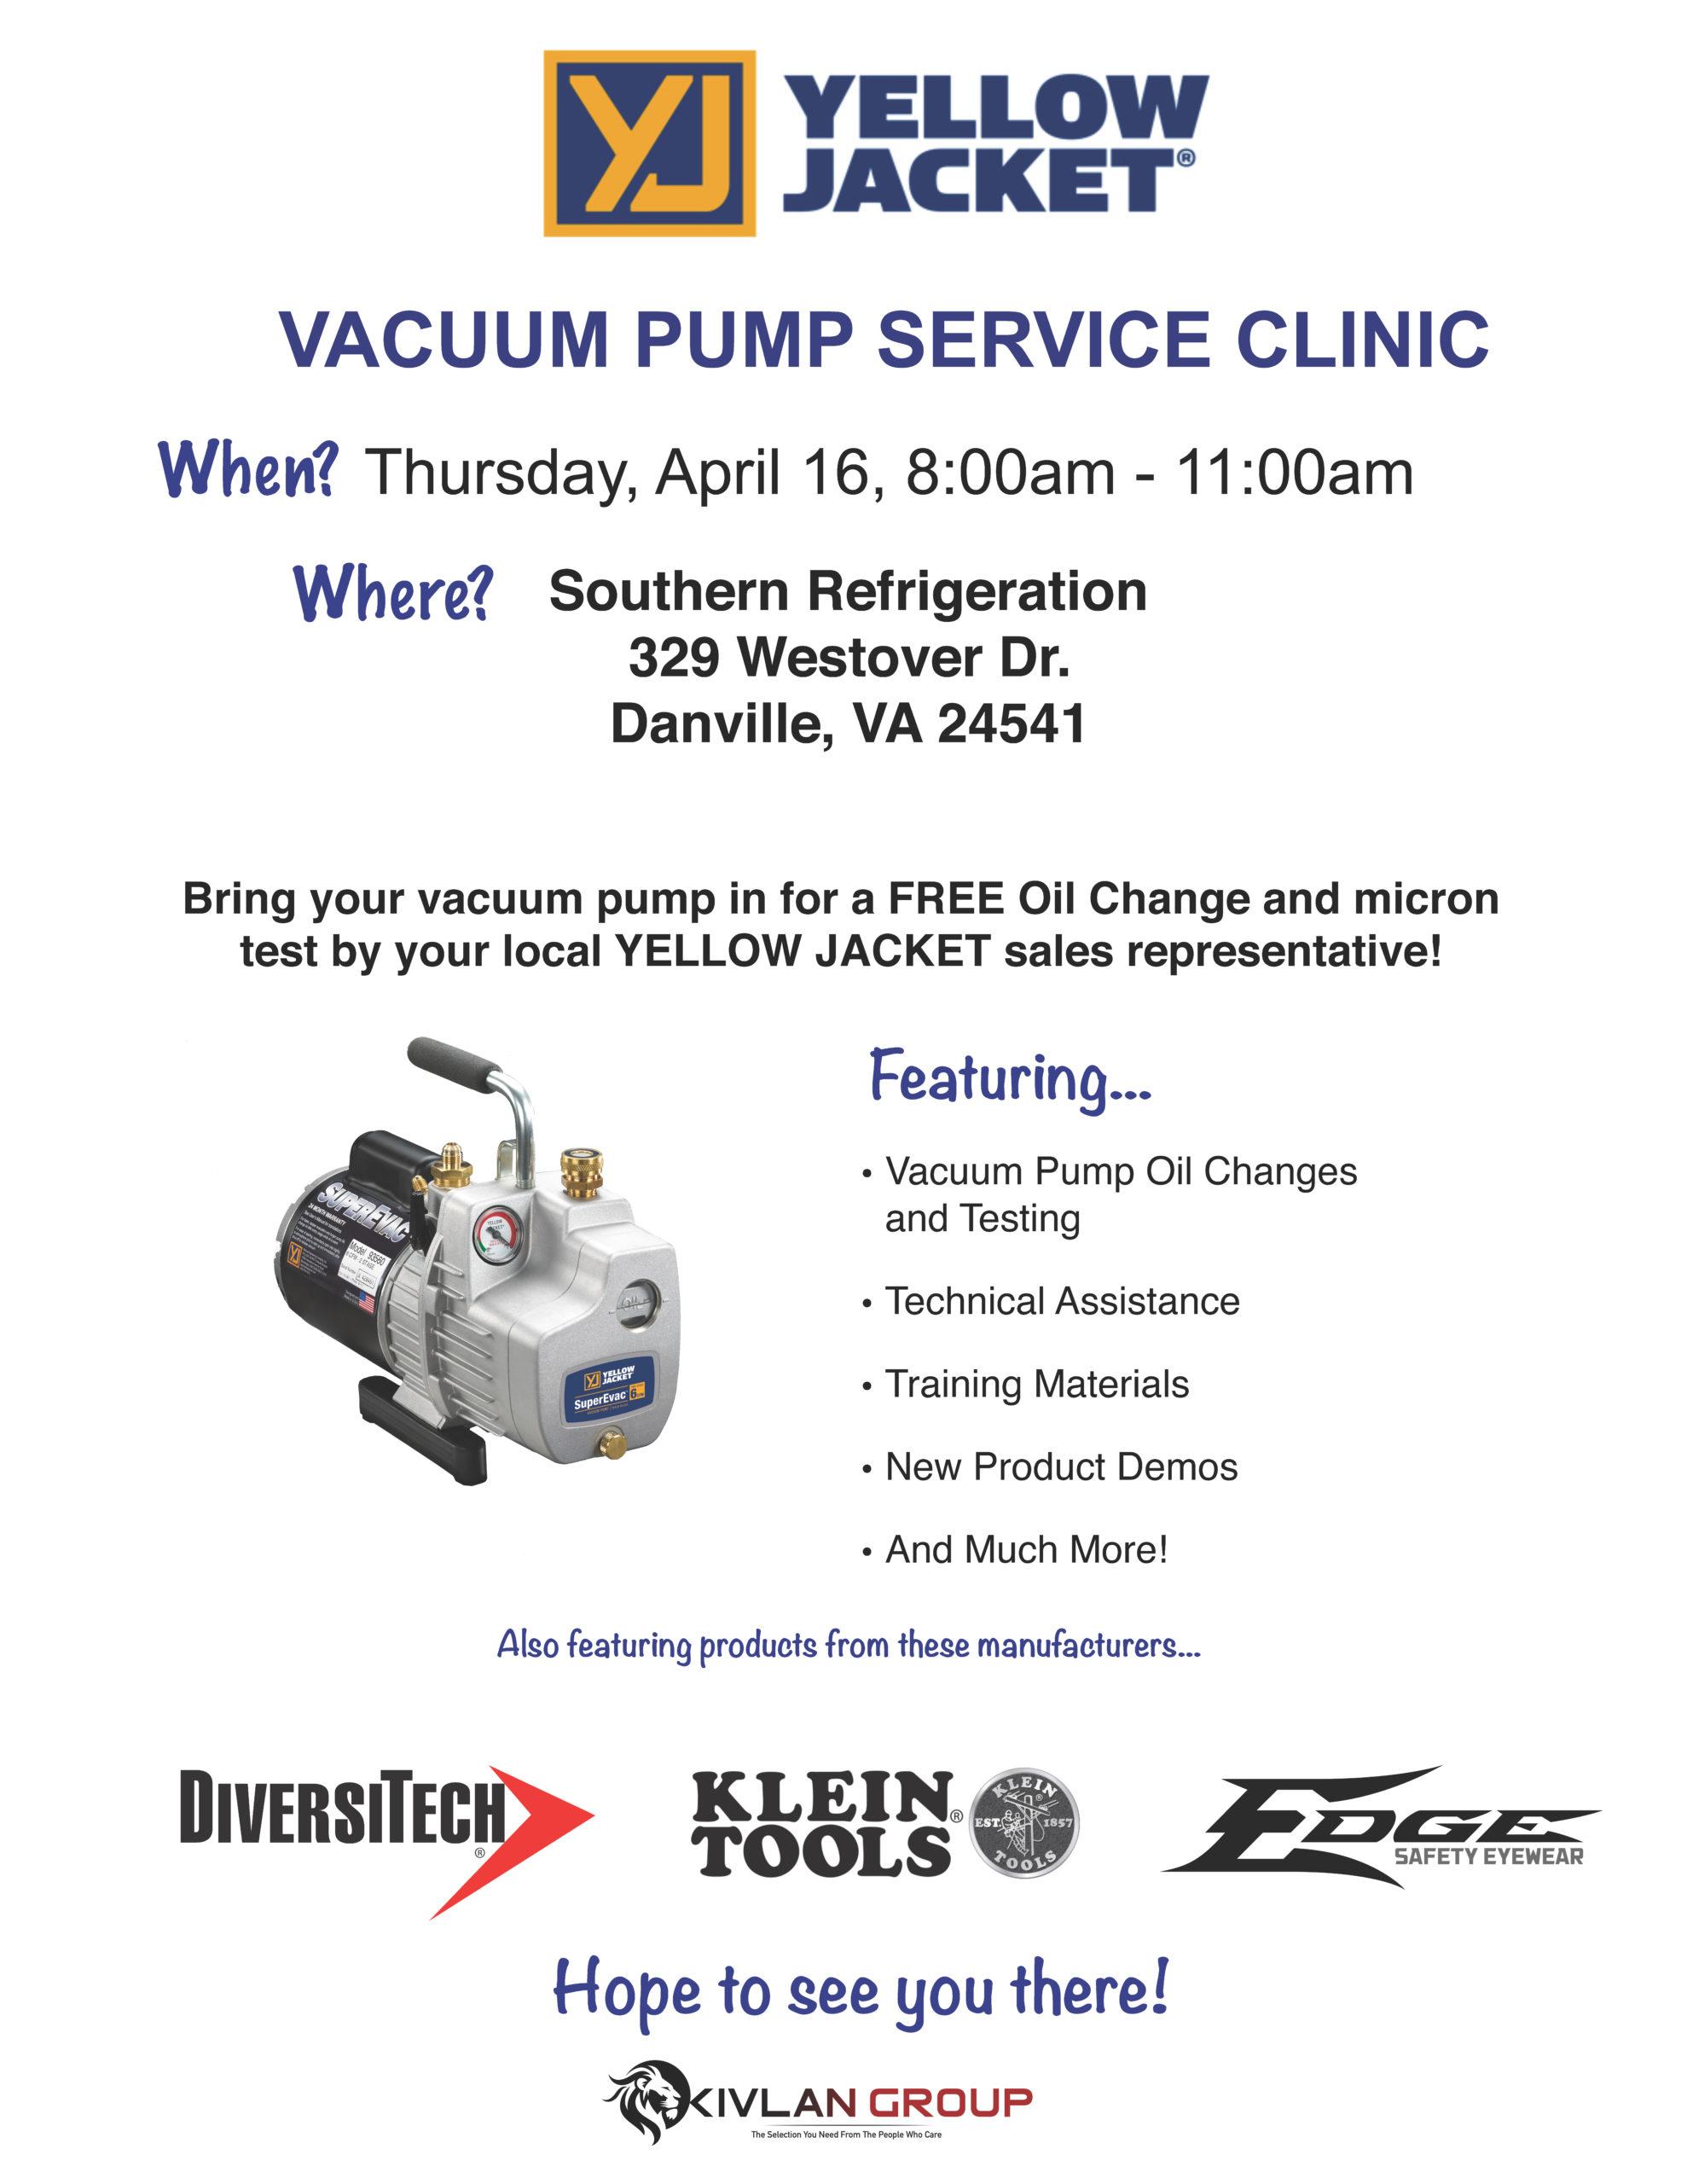 Yellow Jacket Vacuum Pump Service – Danville @ Southern Refrigeration - Danville